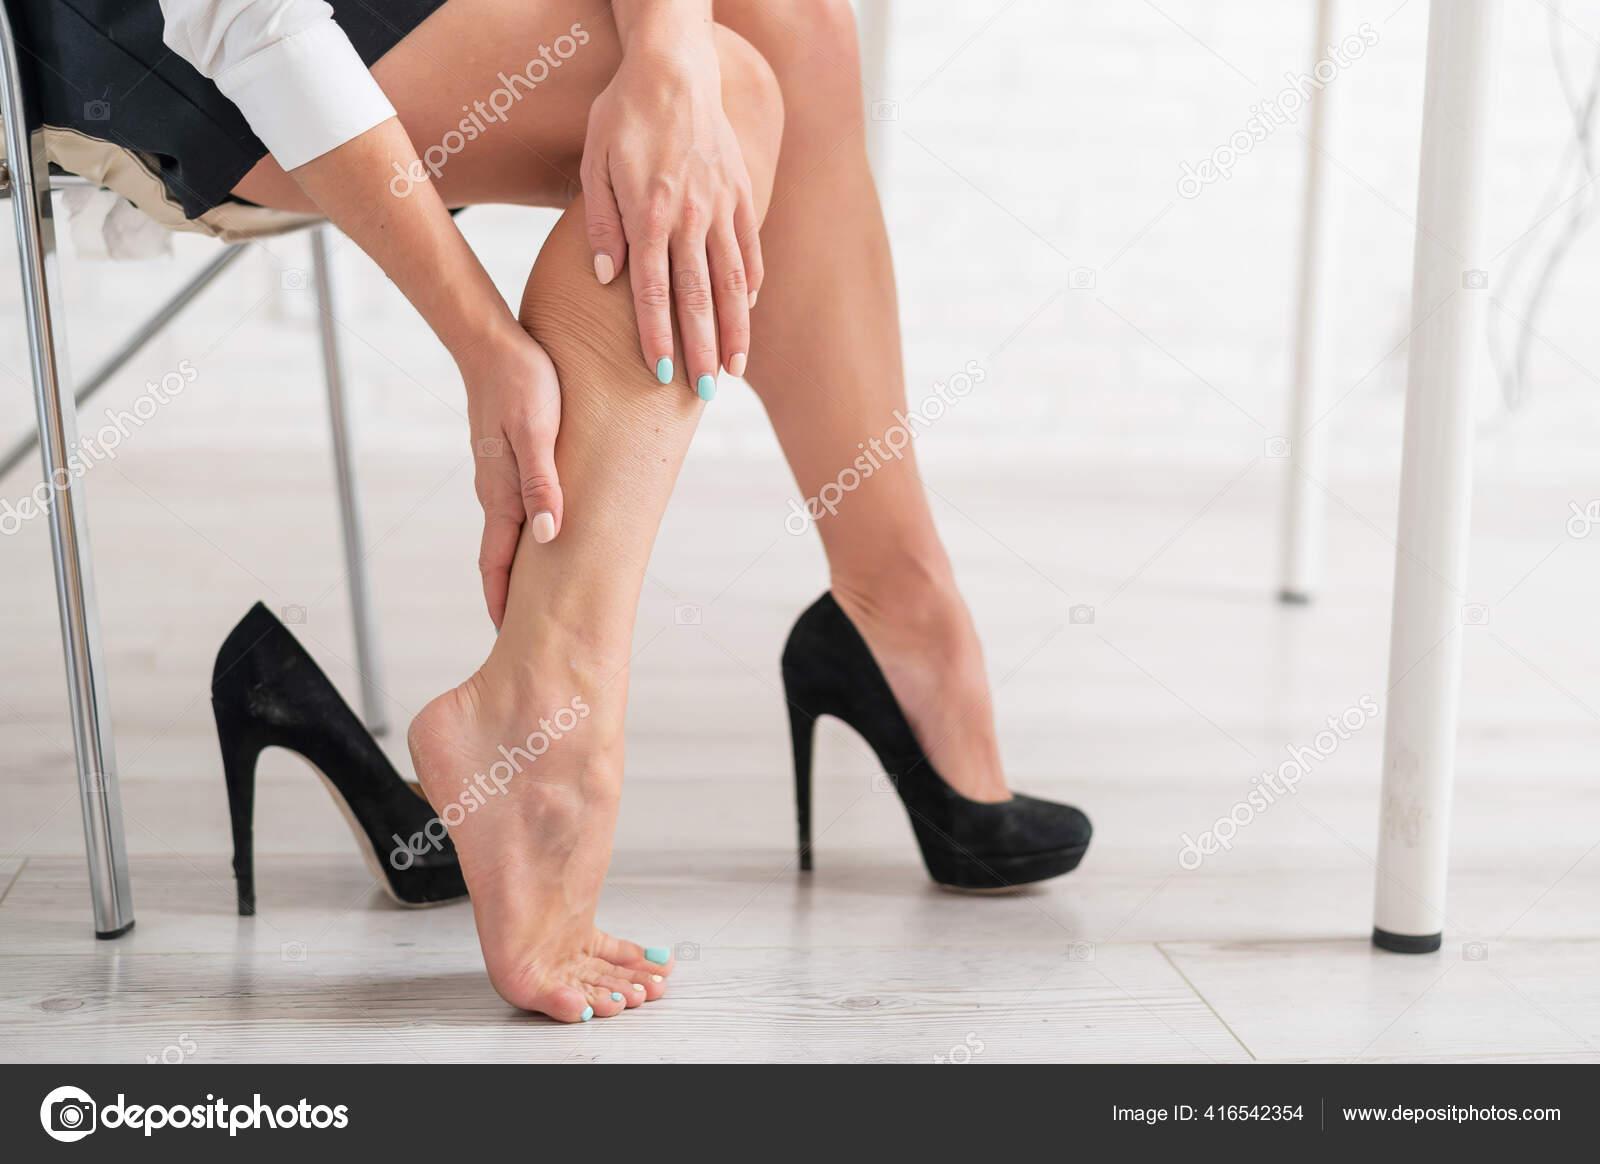 Девушка снимает туфли на работе работа девушки на выставках москва